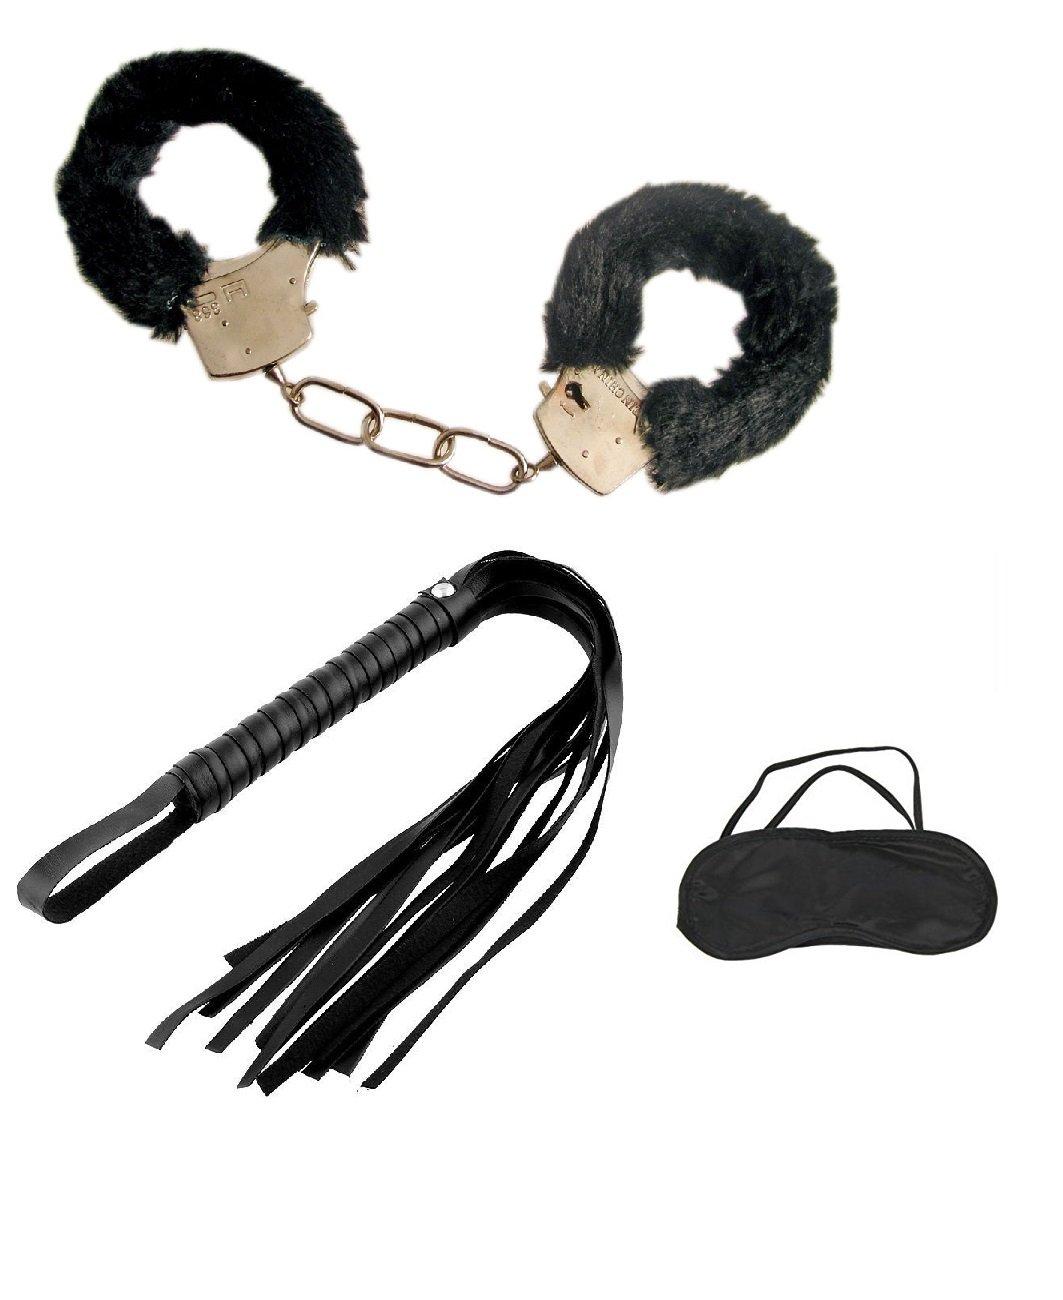 Gioco bondage sadomaso sexy mascherina manette e frustino nero Fair ShopOnline